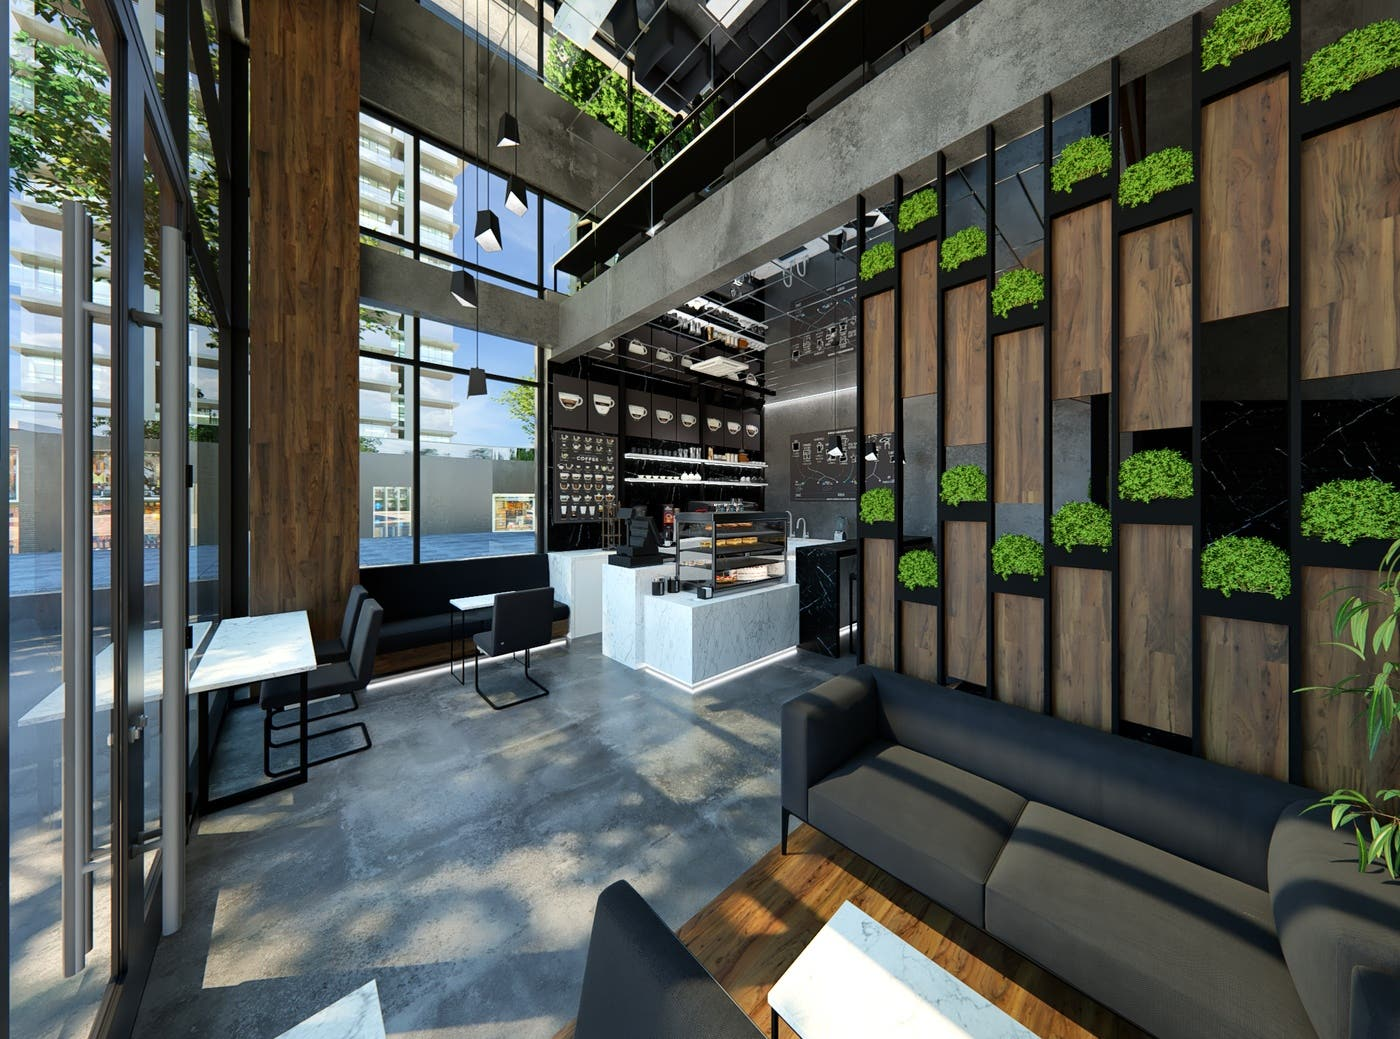 modern-coffee-shop-interior-de.jpg